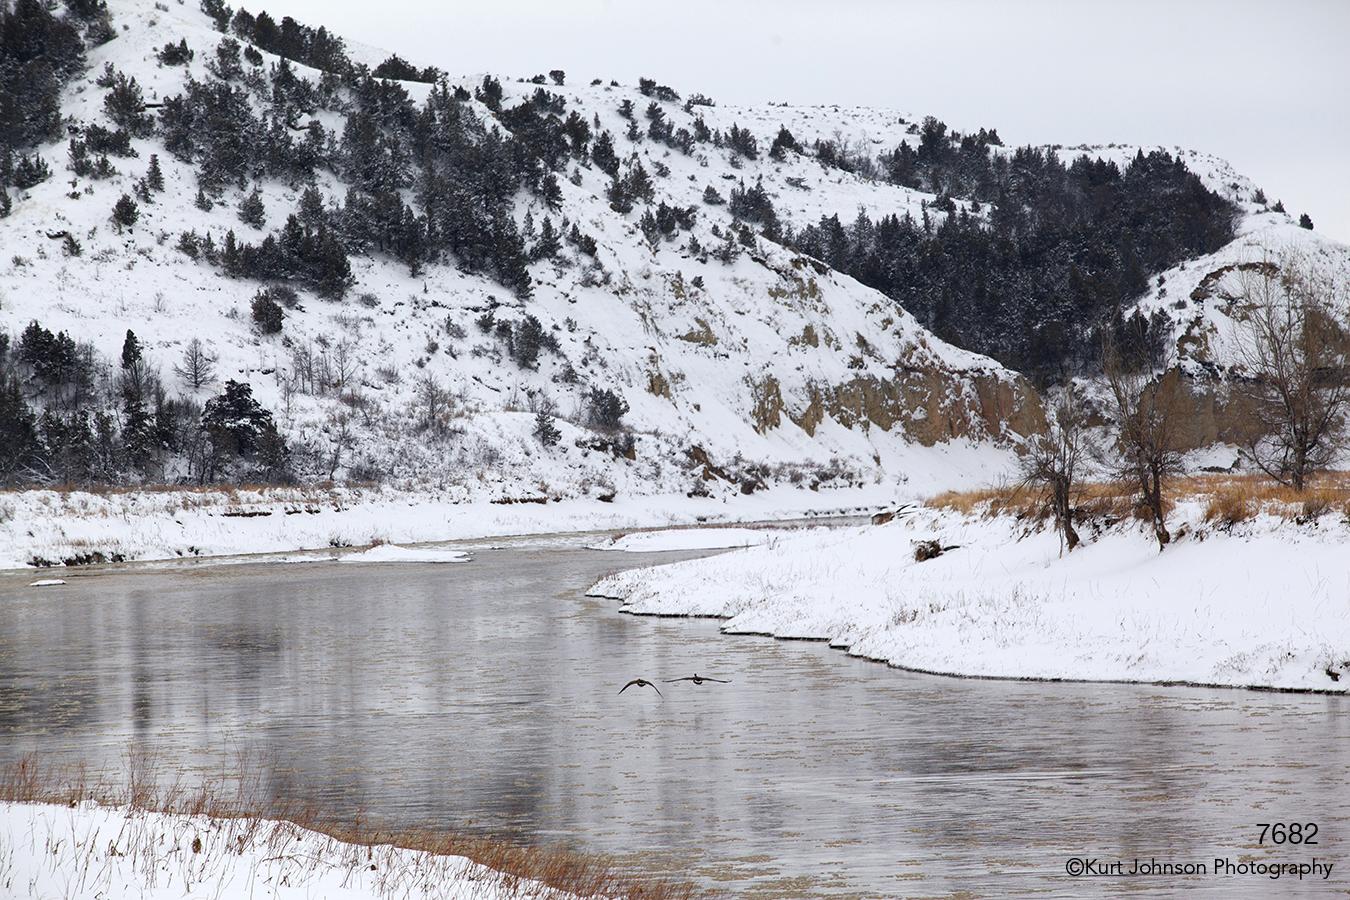 landscape waterscape snow winter water wildlife geese shore river mountains dakota